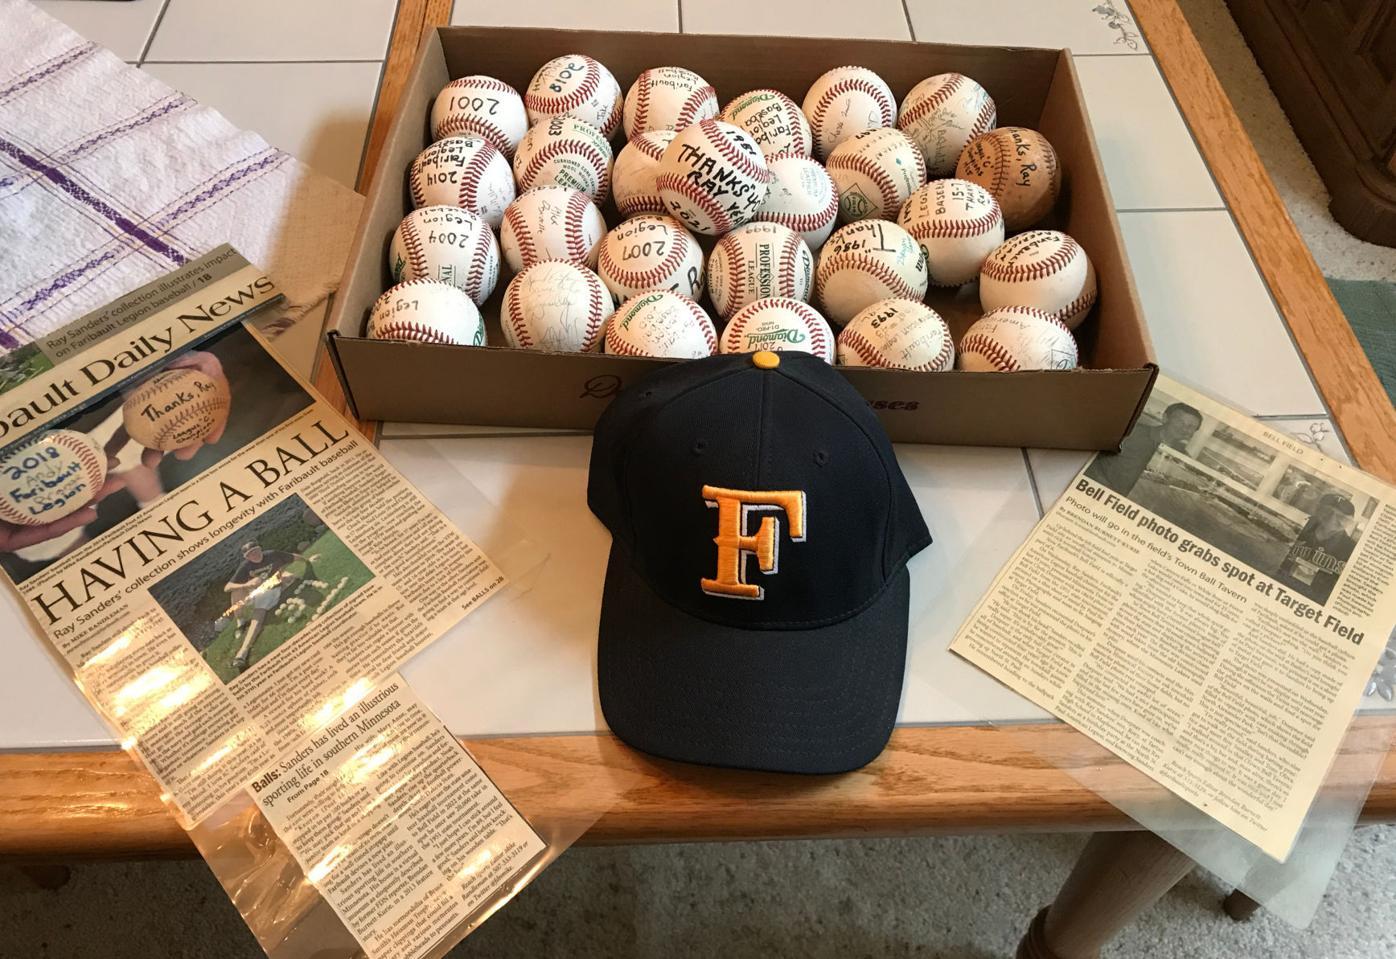 ray sanders baseballs